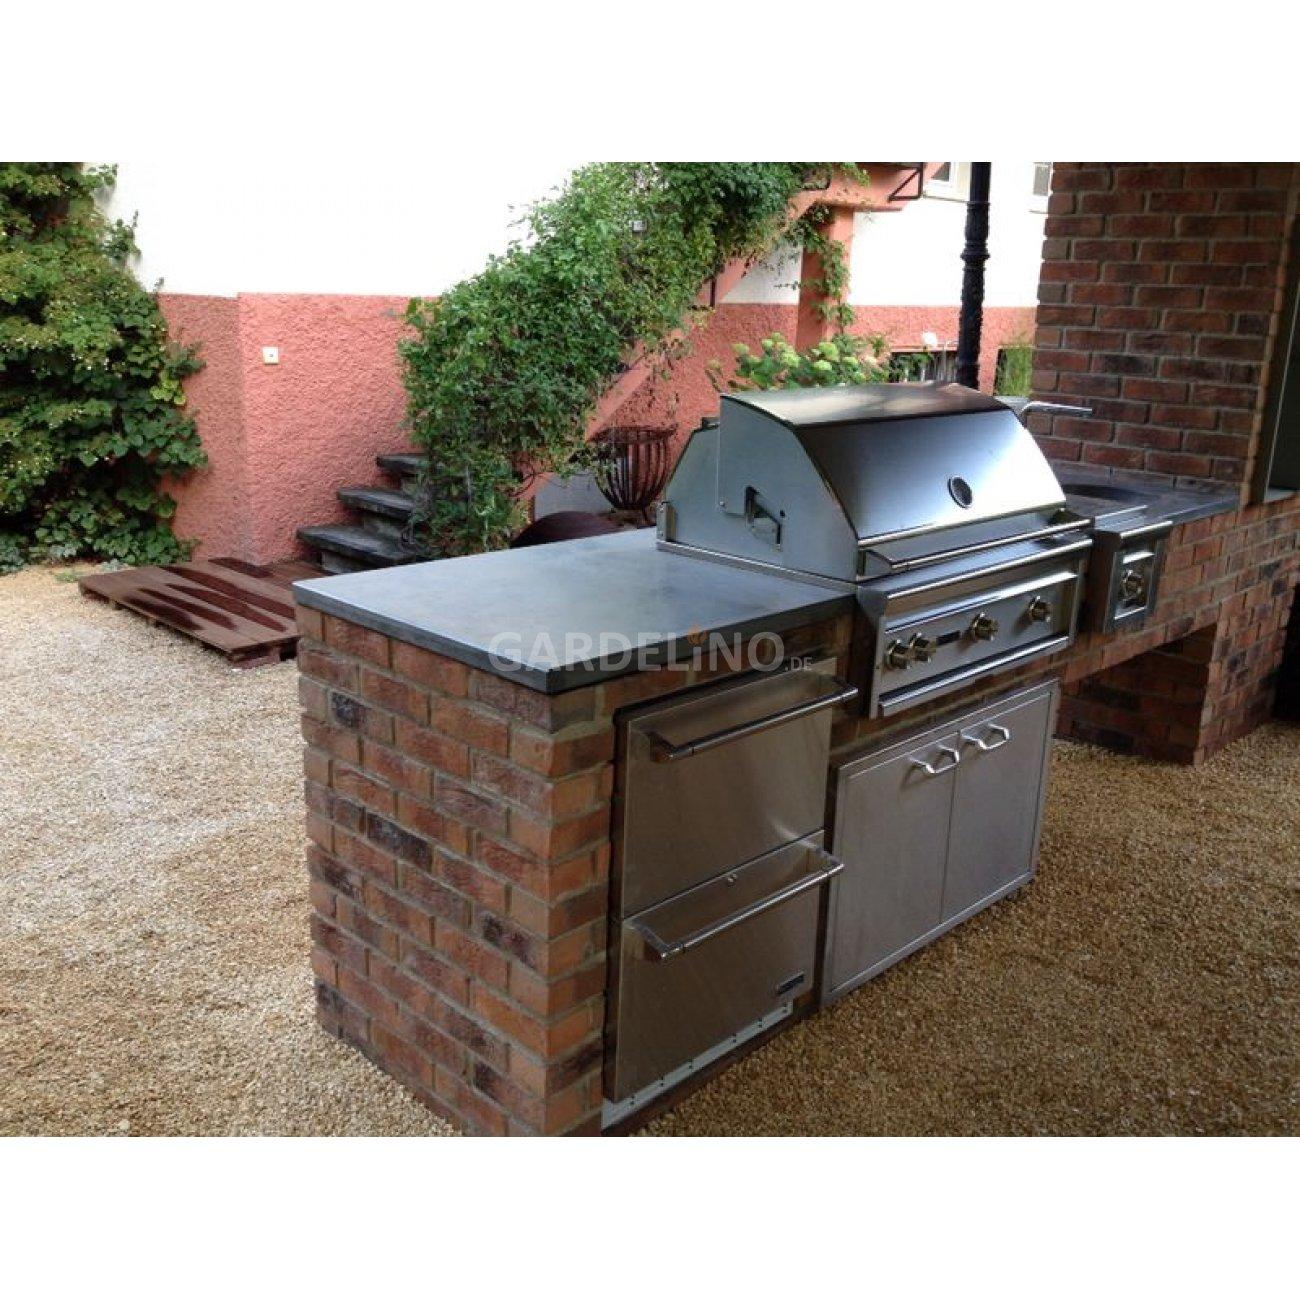 Aussenküche Gemauert lynx outdoor küche i partnerbericht auf gardelino de